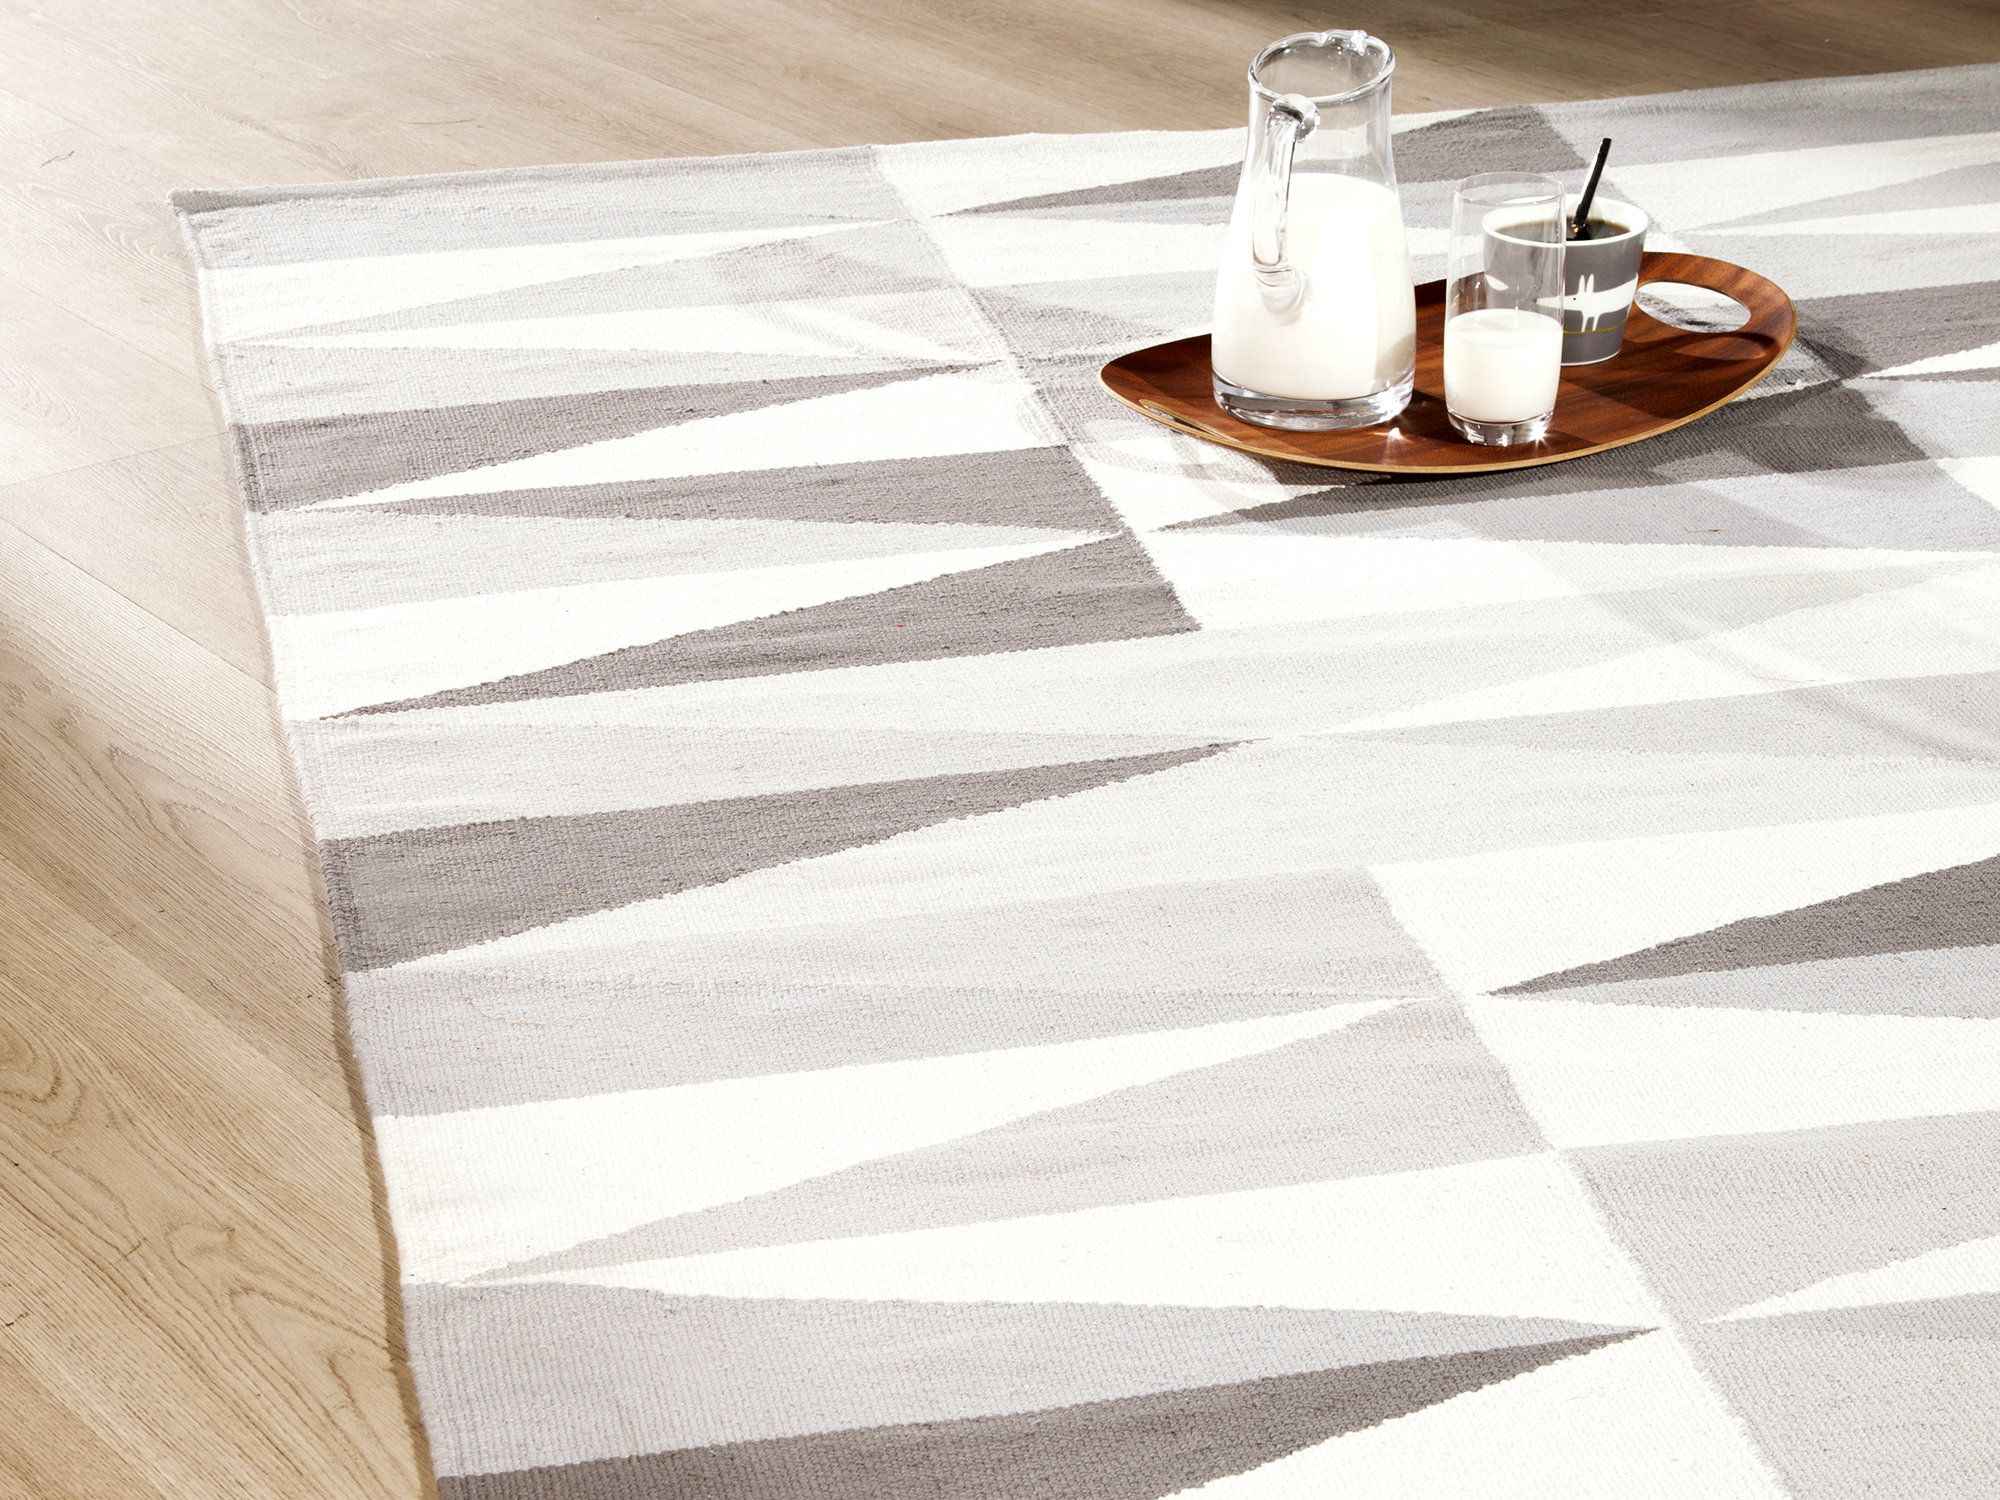 Inspirant Tapis Beige Gris Decoration Francaise Rugs